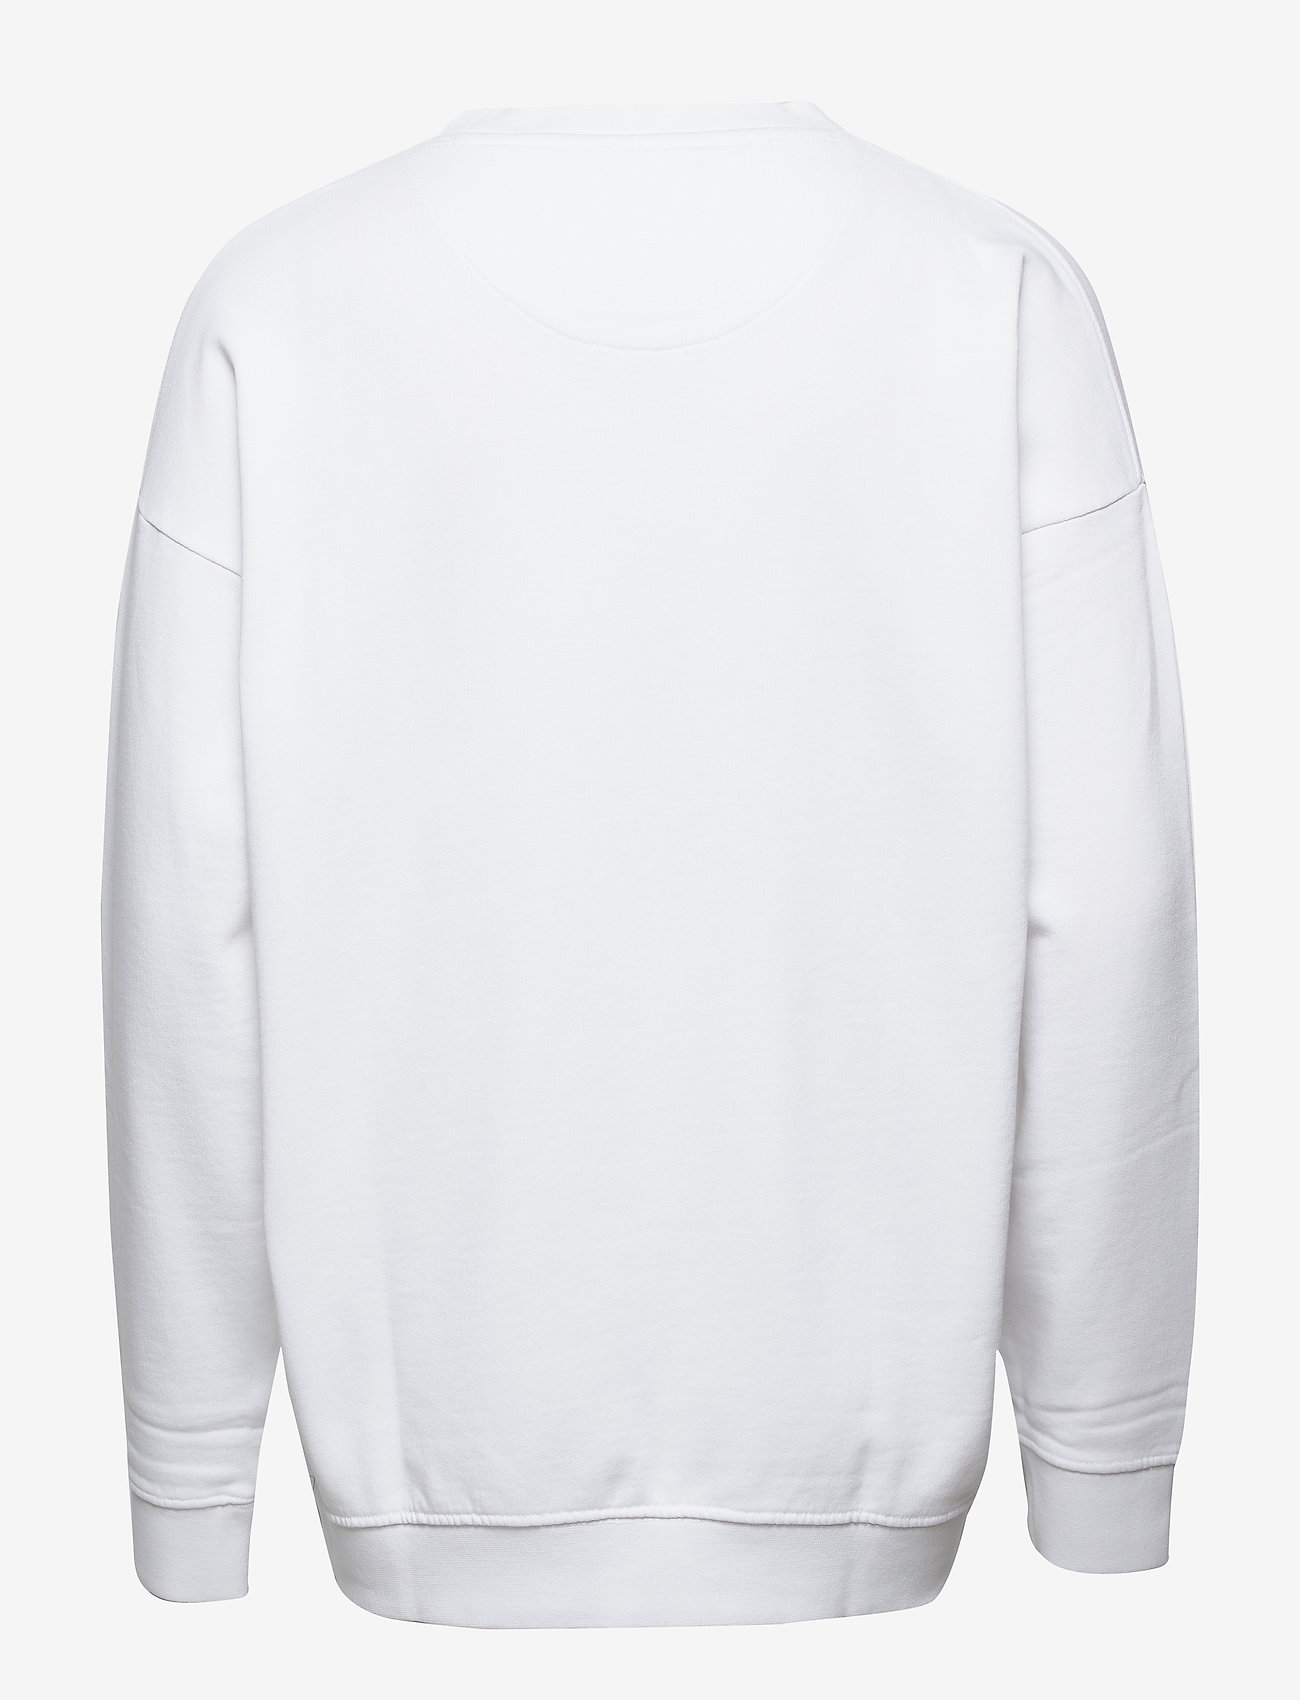 Björn Borg - CREW ARCHIVE LOOSE ARCHIVE - sweatshirts - brilliant white - 1